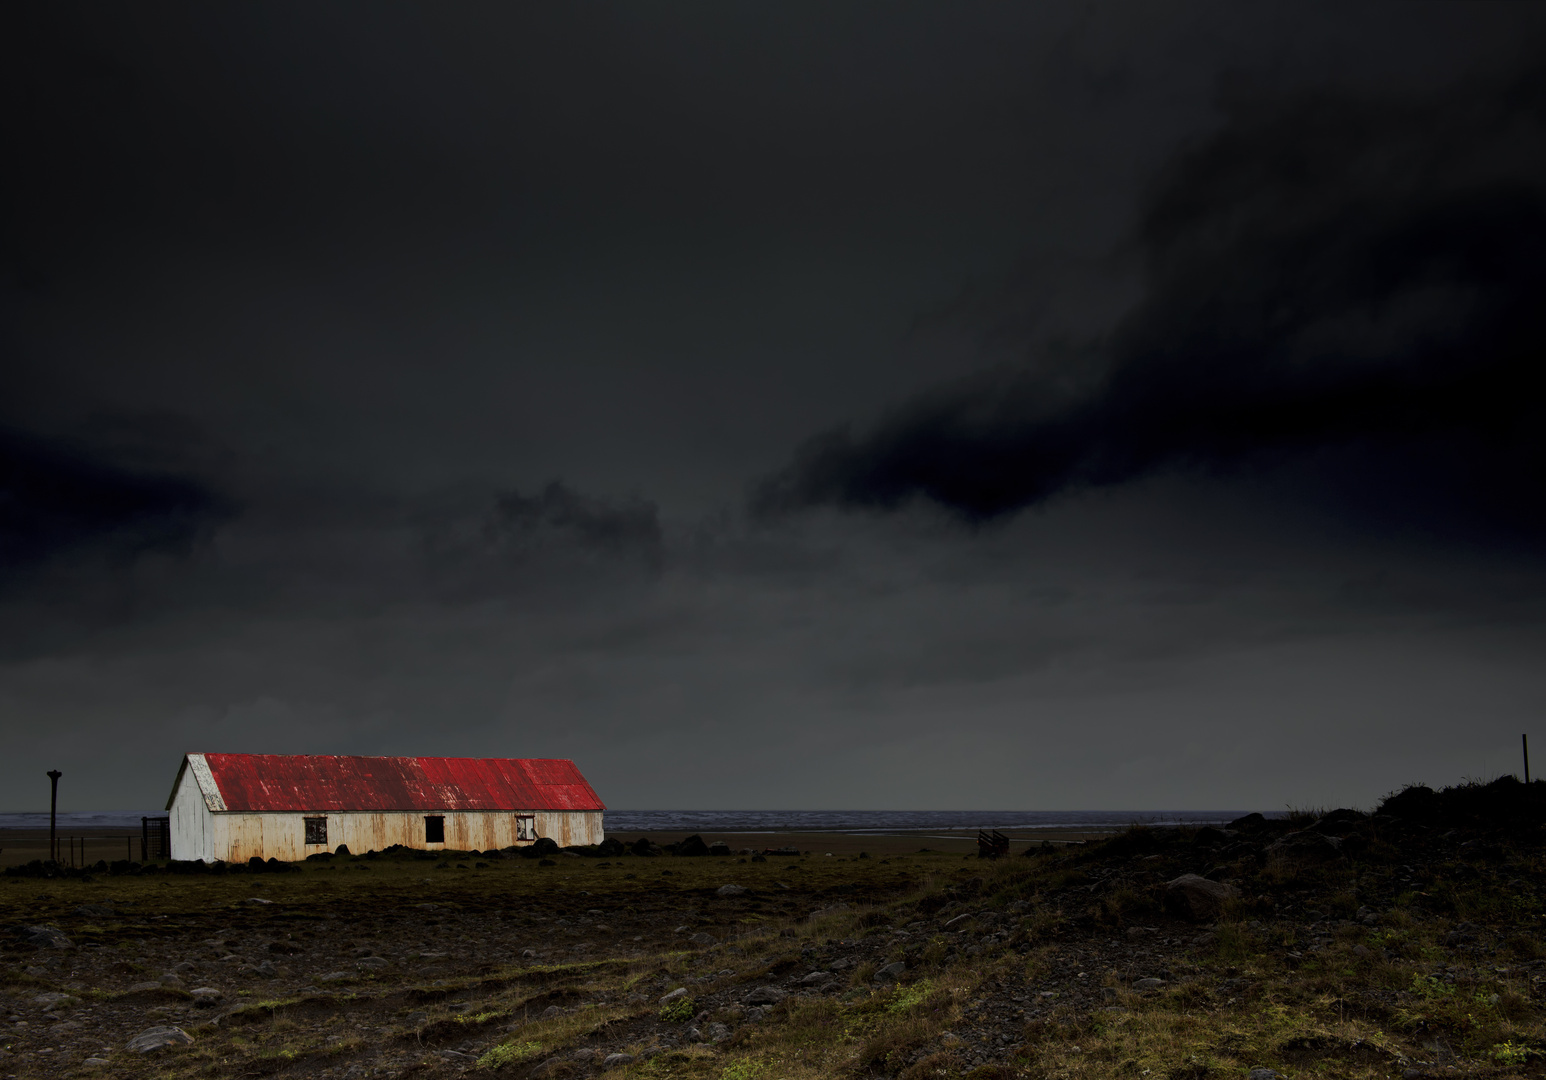 Old Farmhouse in the dark